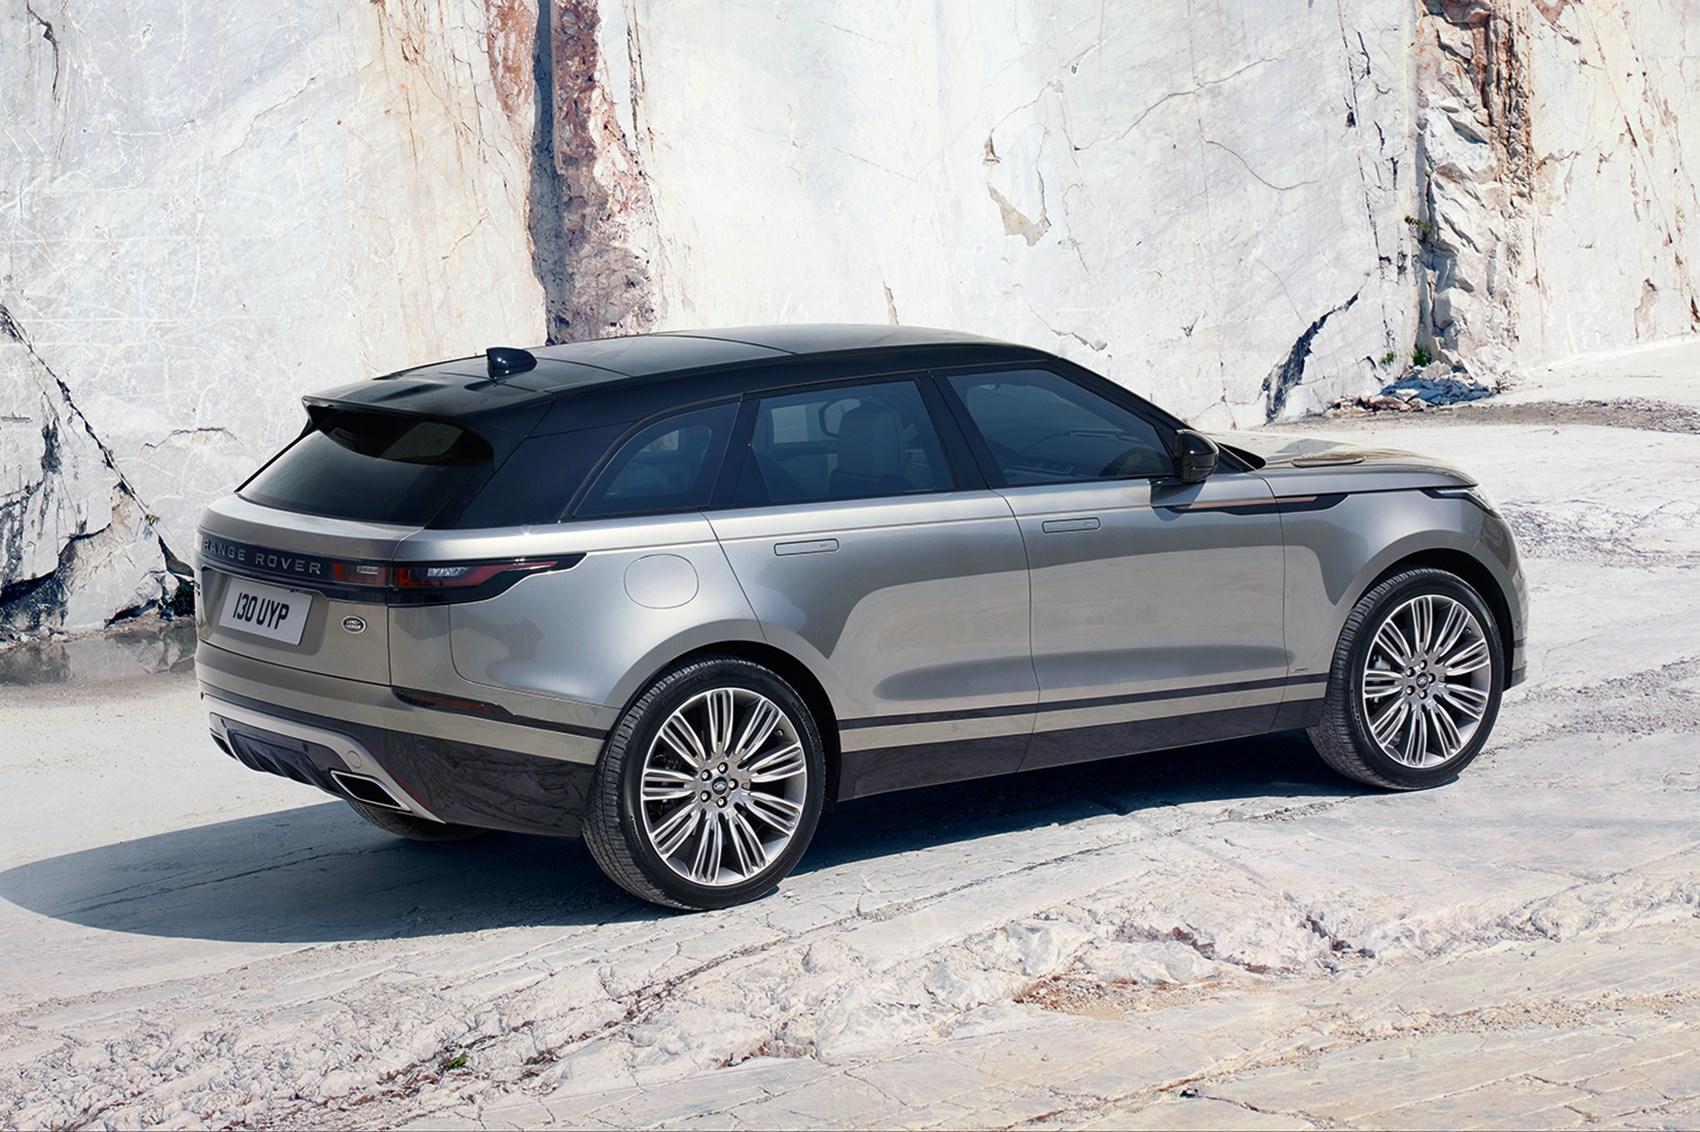 new range rover velar revealed in pictures by car magazine. Black Bedroom Furniture Sets. Home Design Ideas